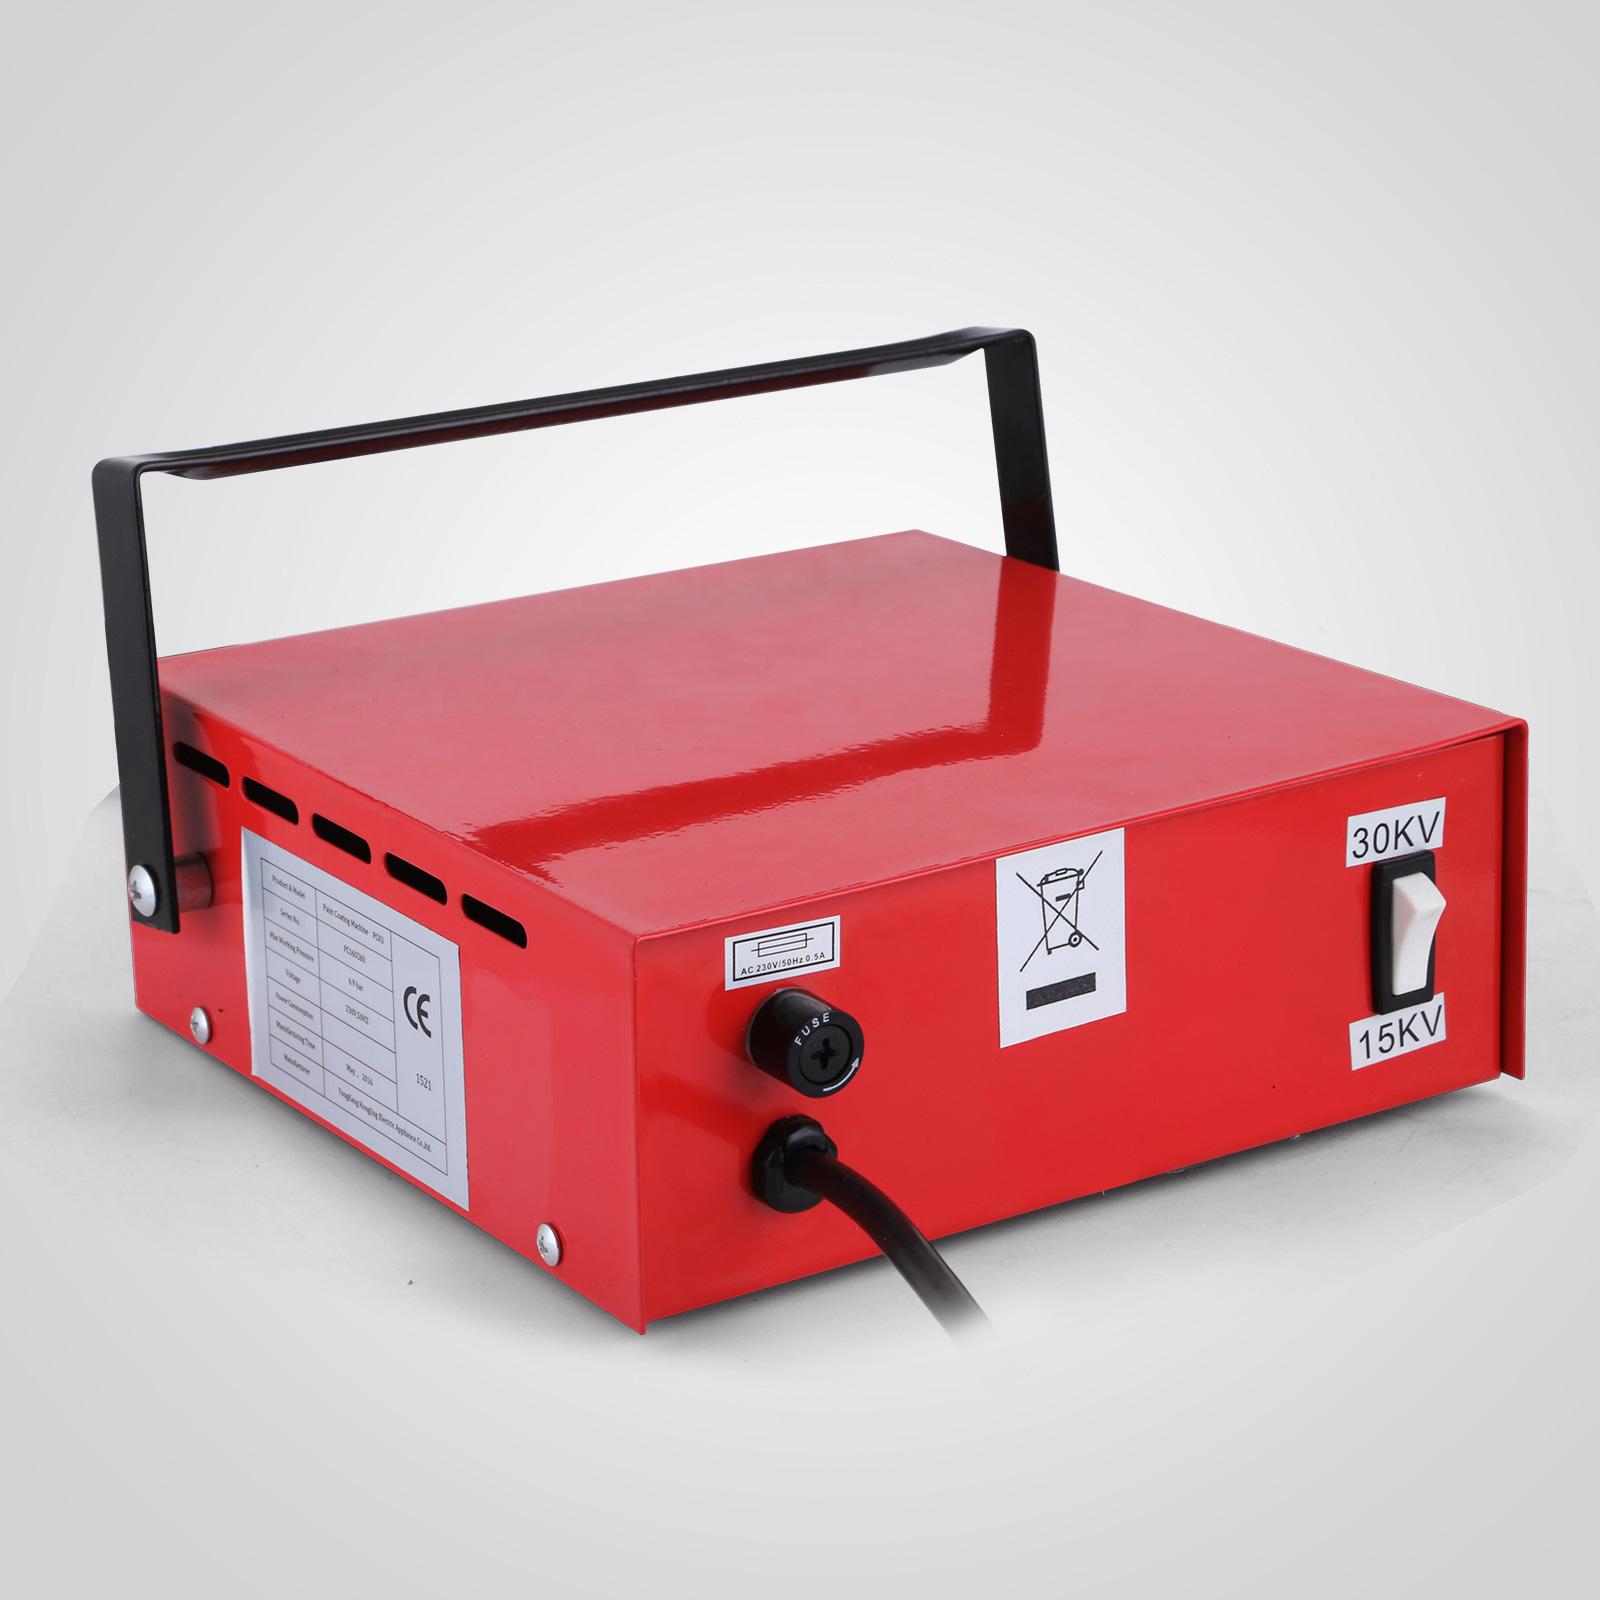 Powder Coating System Portable Electrostatic Spray Paint